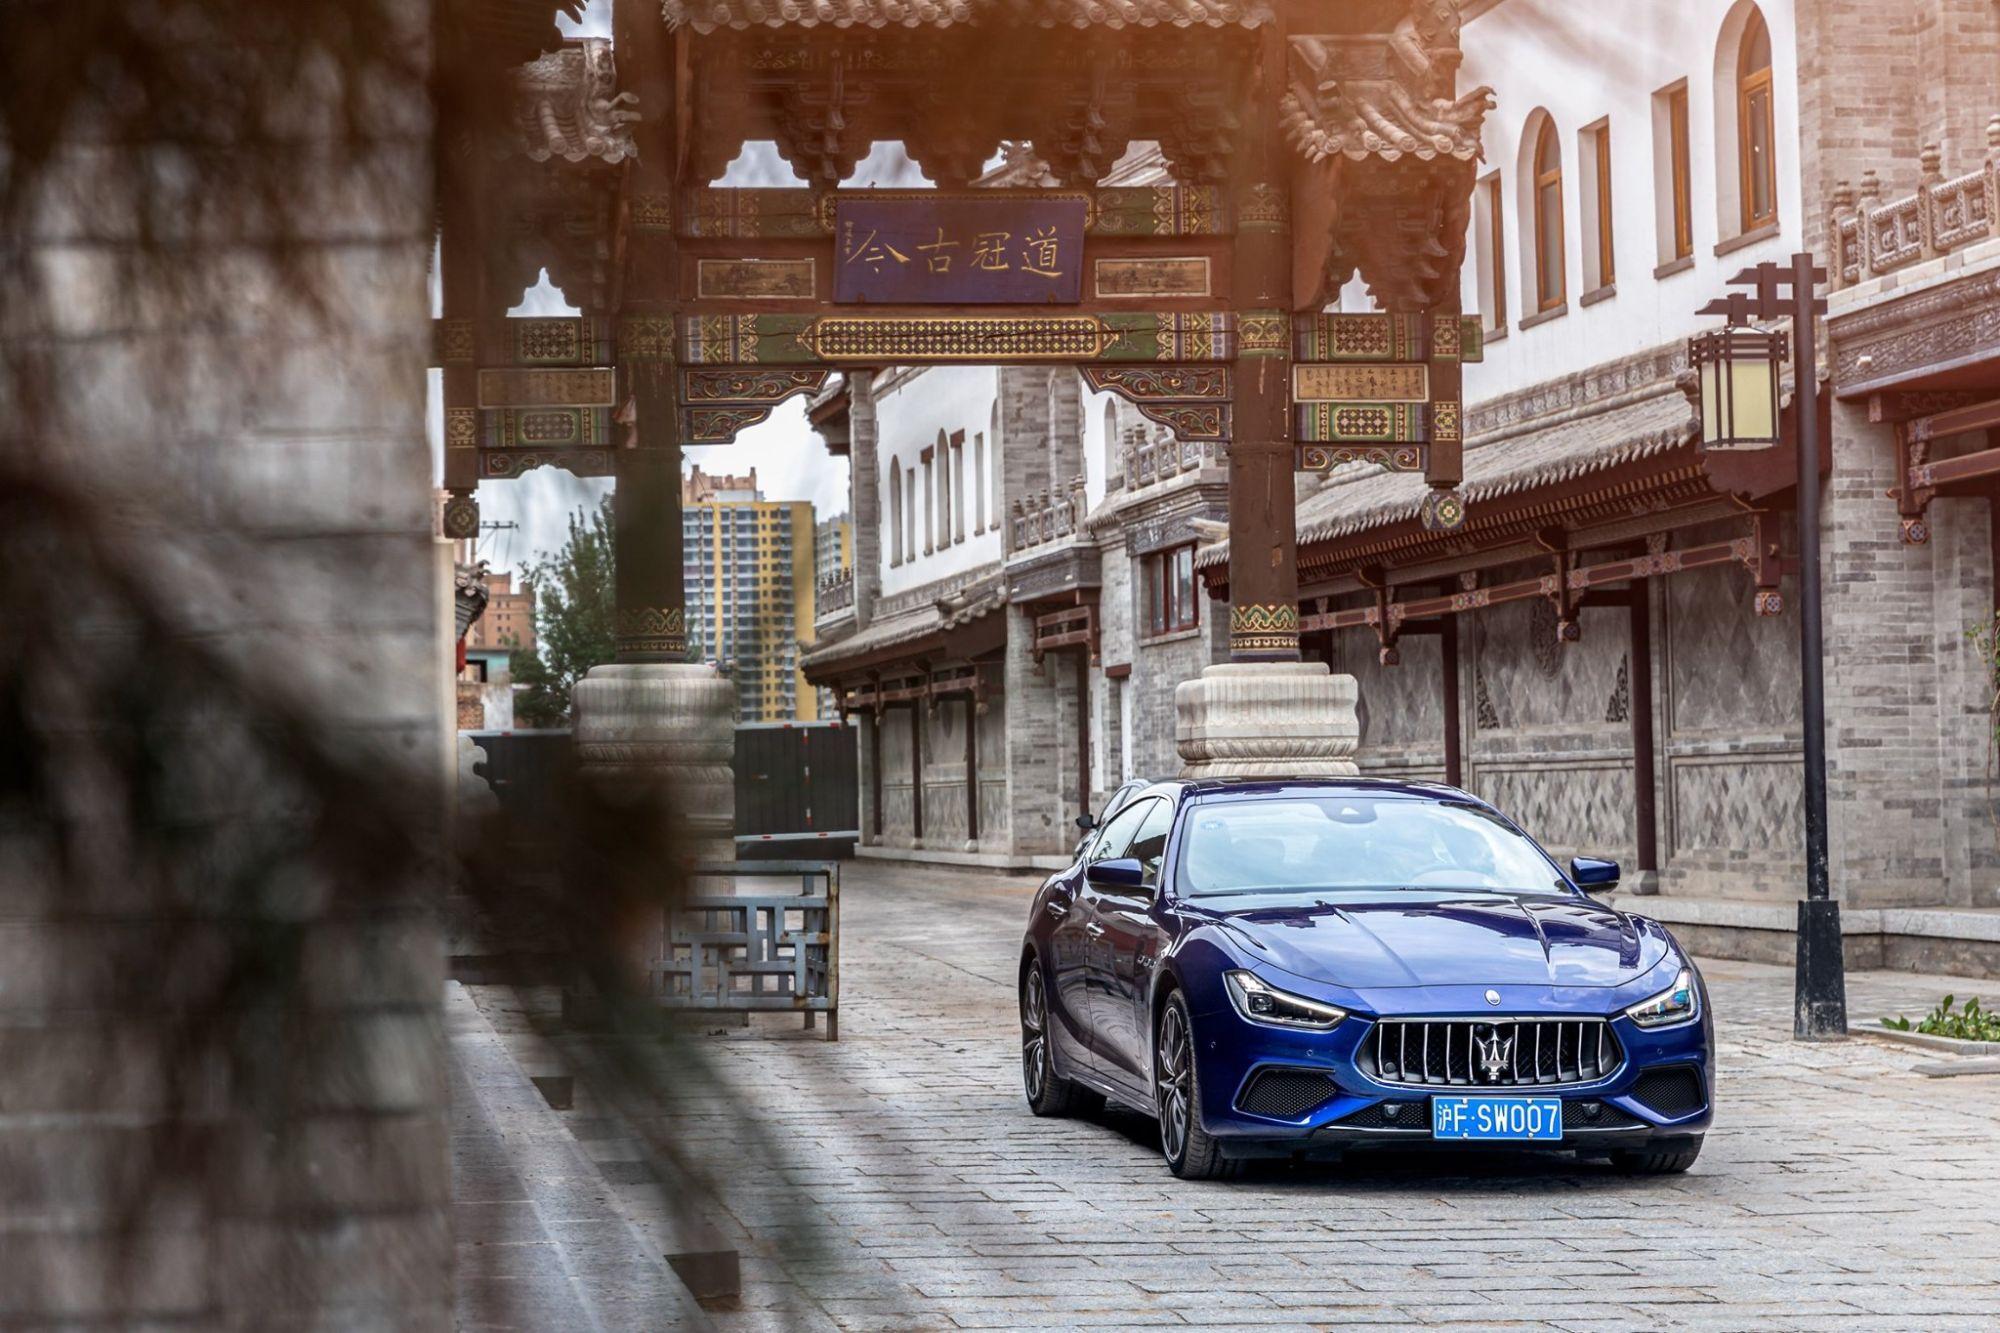 Maserati finaliza el Grand Tour Tributo a China El viaje de 10,000 km celebra los 15 años de Maserati en China